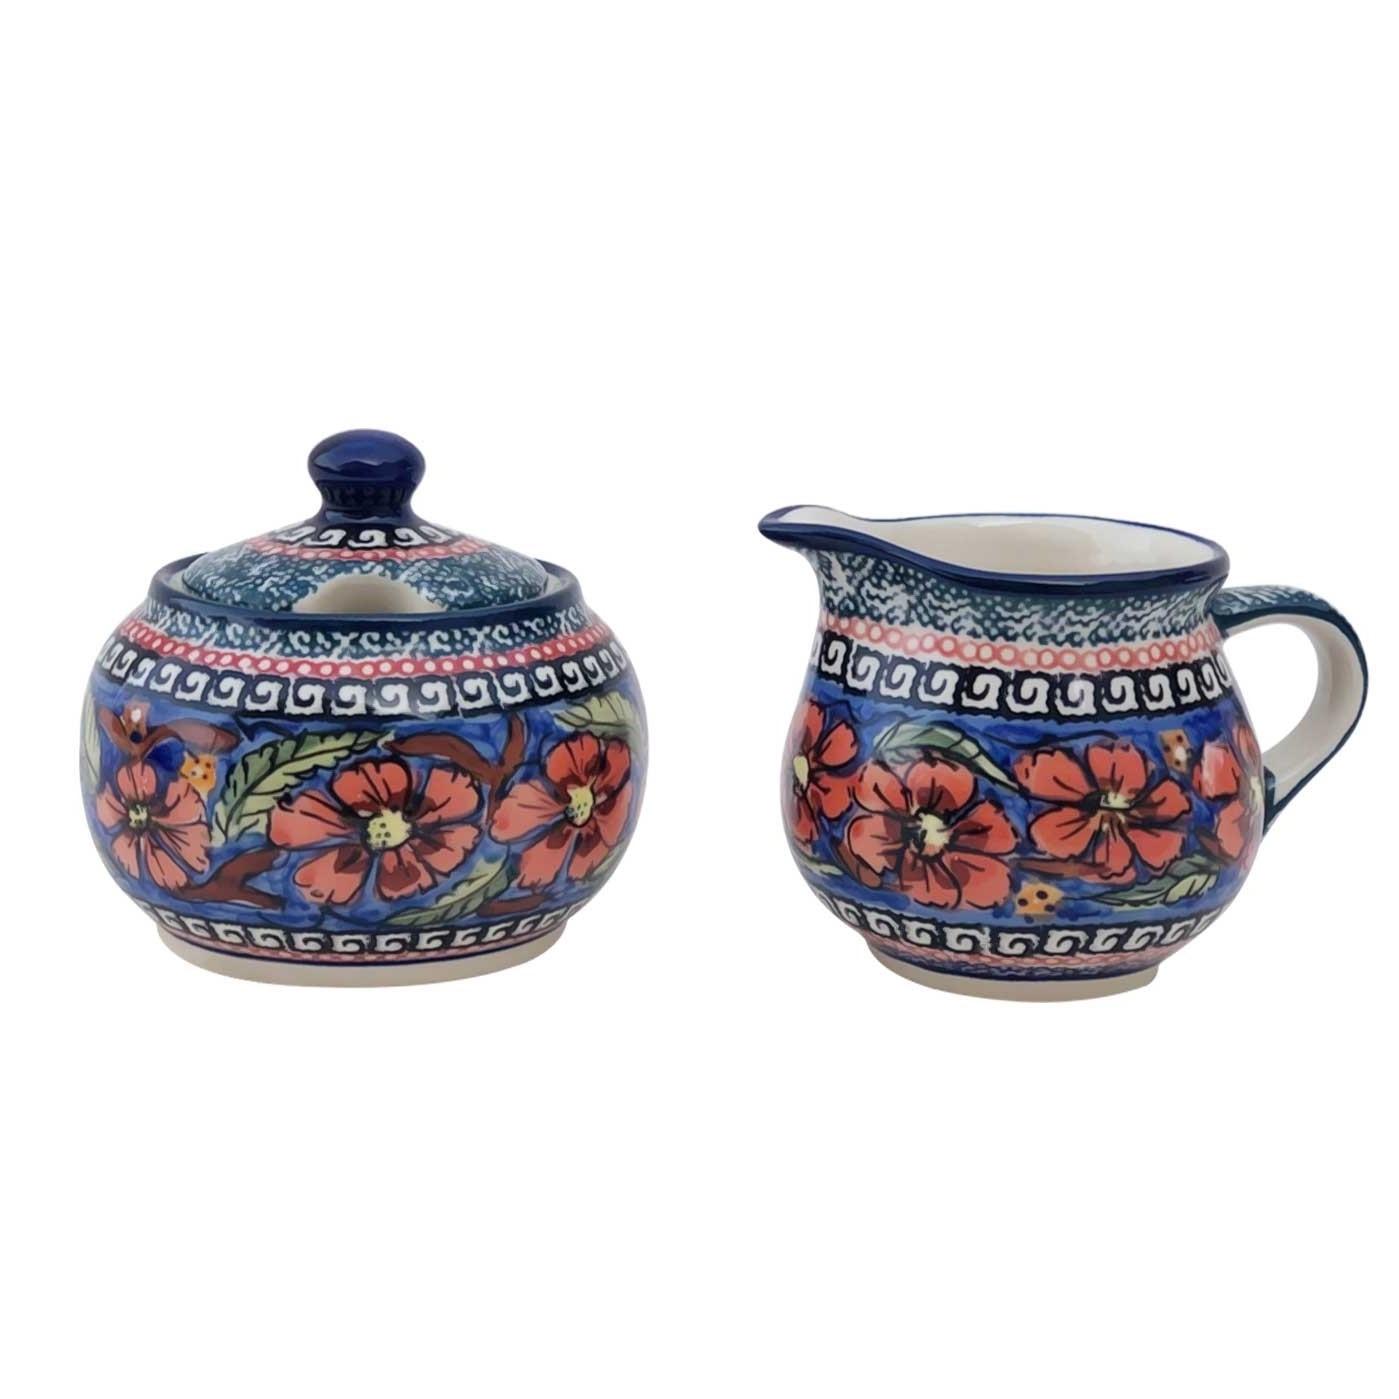 Pottery Avenue Cherished Friends Creamer and Sugar Bowl - Stoneware